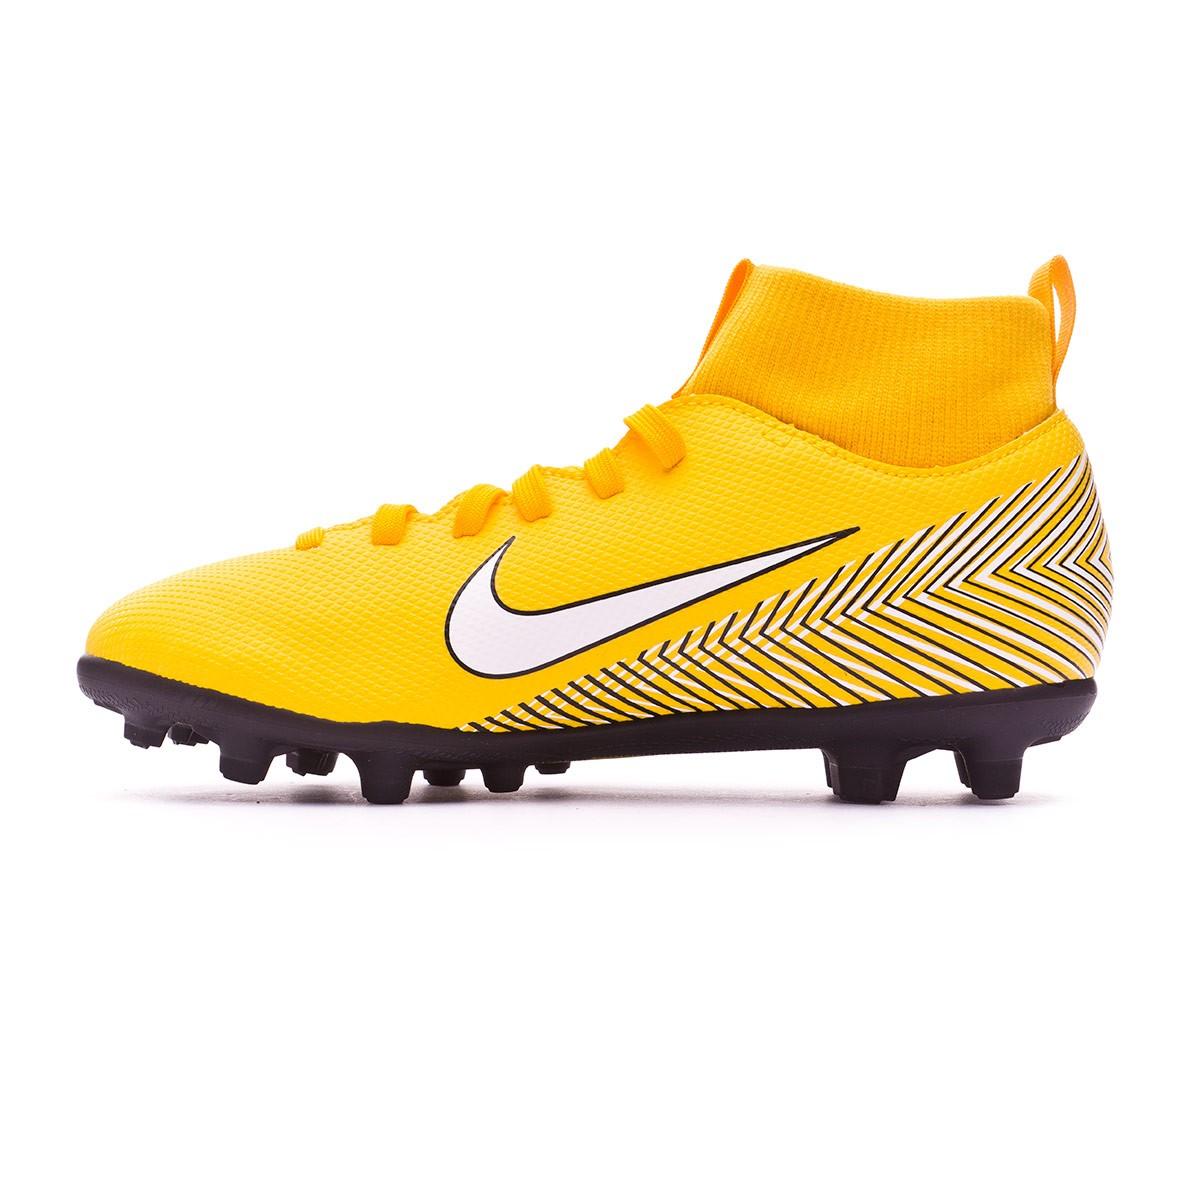 2a72b9407f11d Chuteira Nike Mercurial Superfly VI Club MG Neymar Crianças Yellow-Black -  Loja de futebol Fútbol Emotion